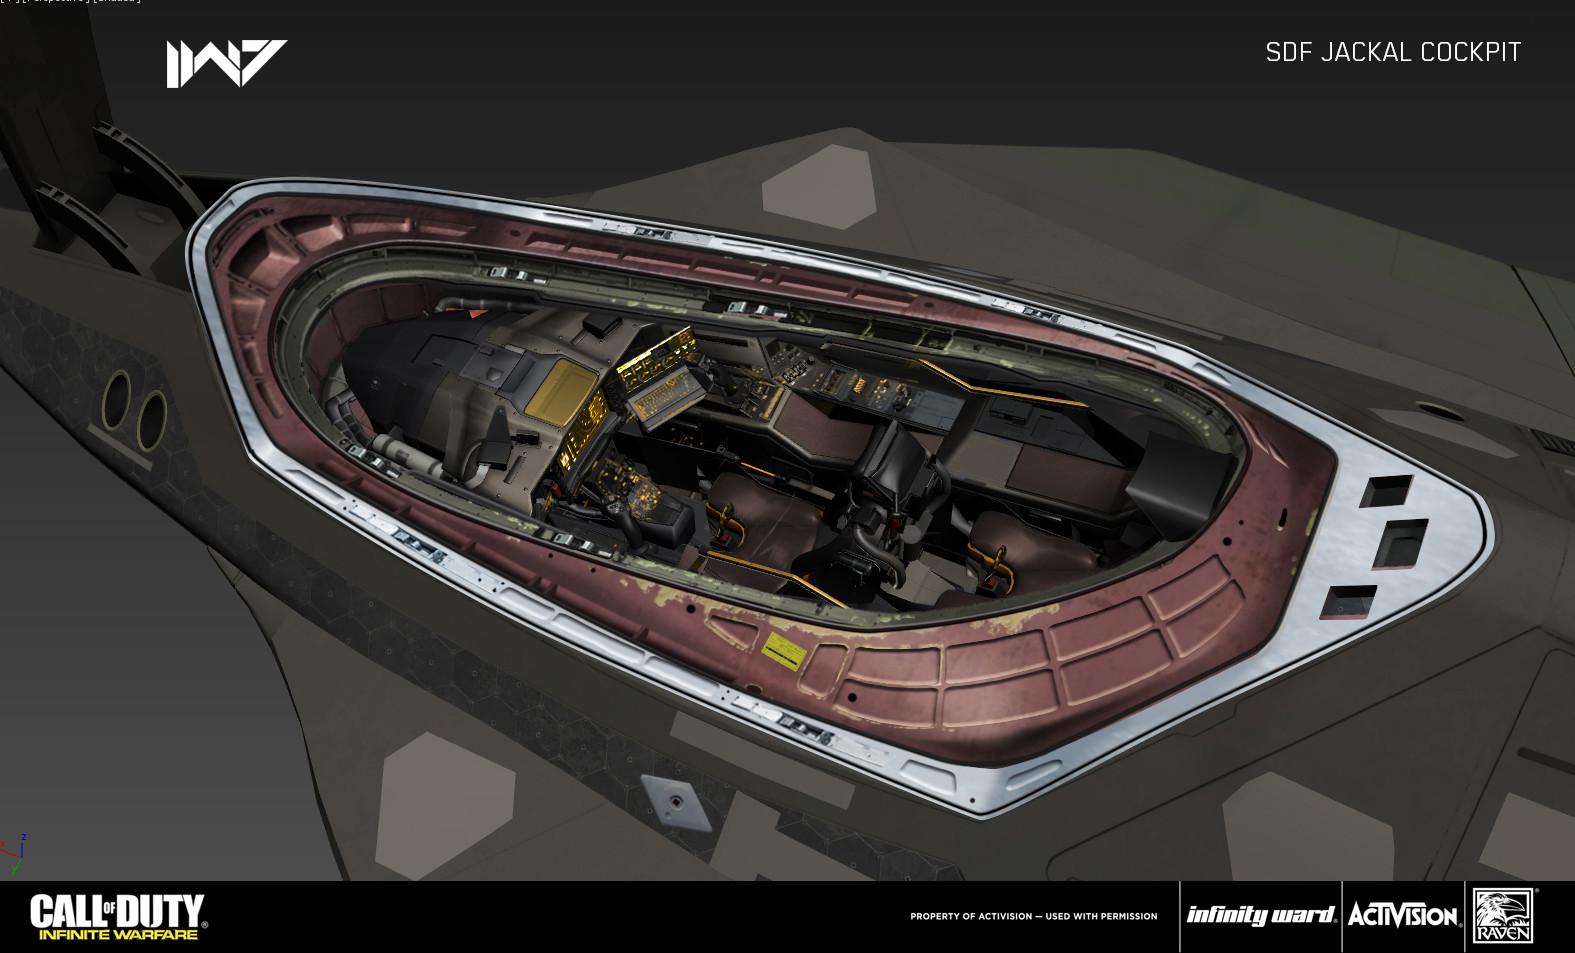 Simon ko veh sko iw7 04 21 16 sdf cockpit